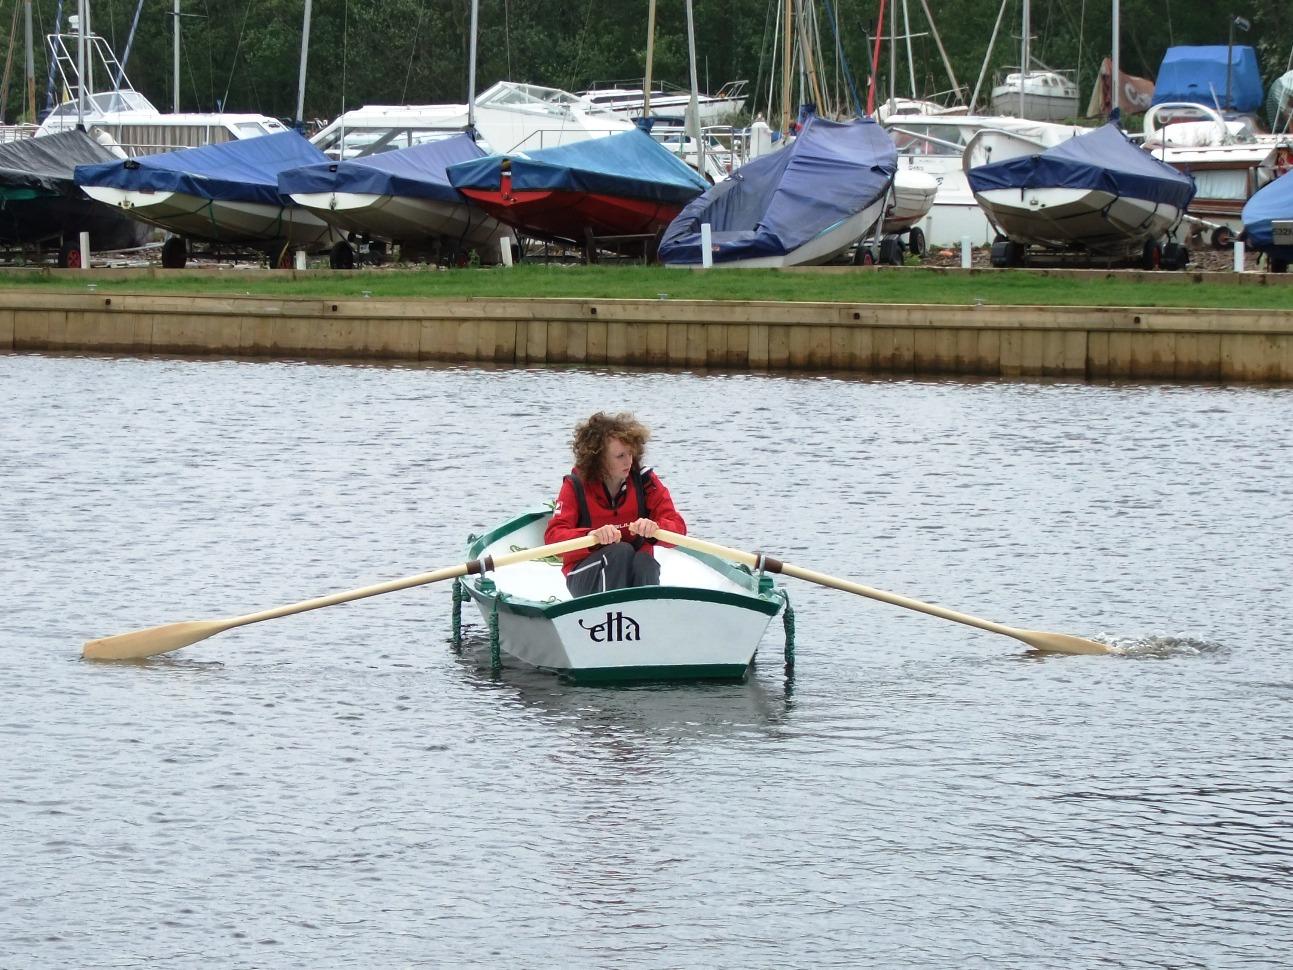 Ella Skiff Free Boat Plans Plywood Boat Rowing Boat Gavin Atkin